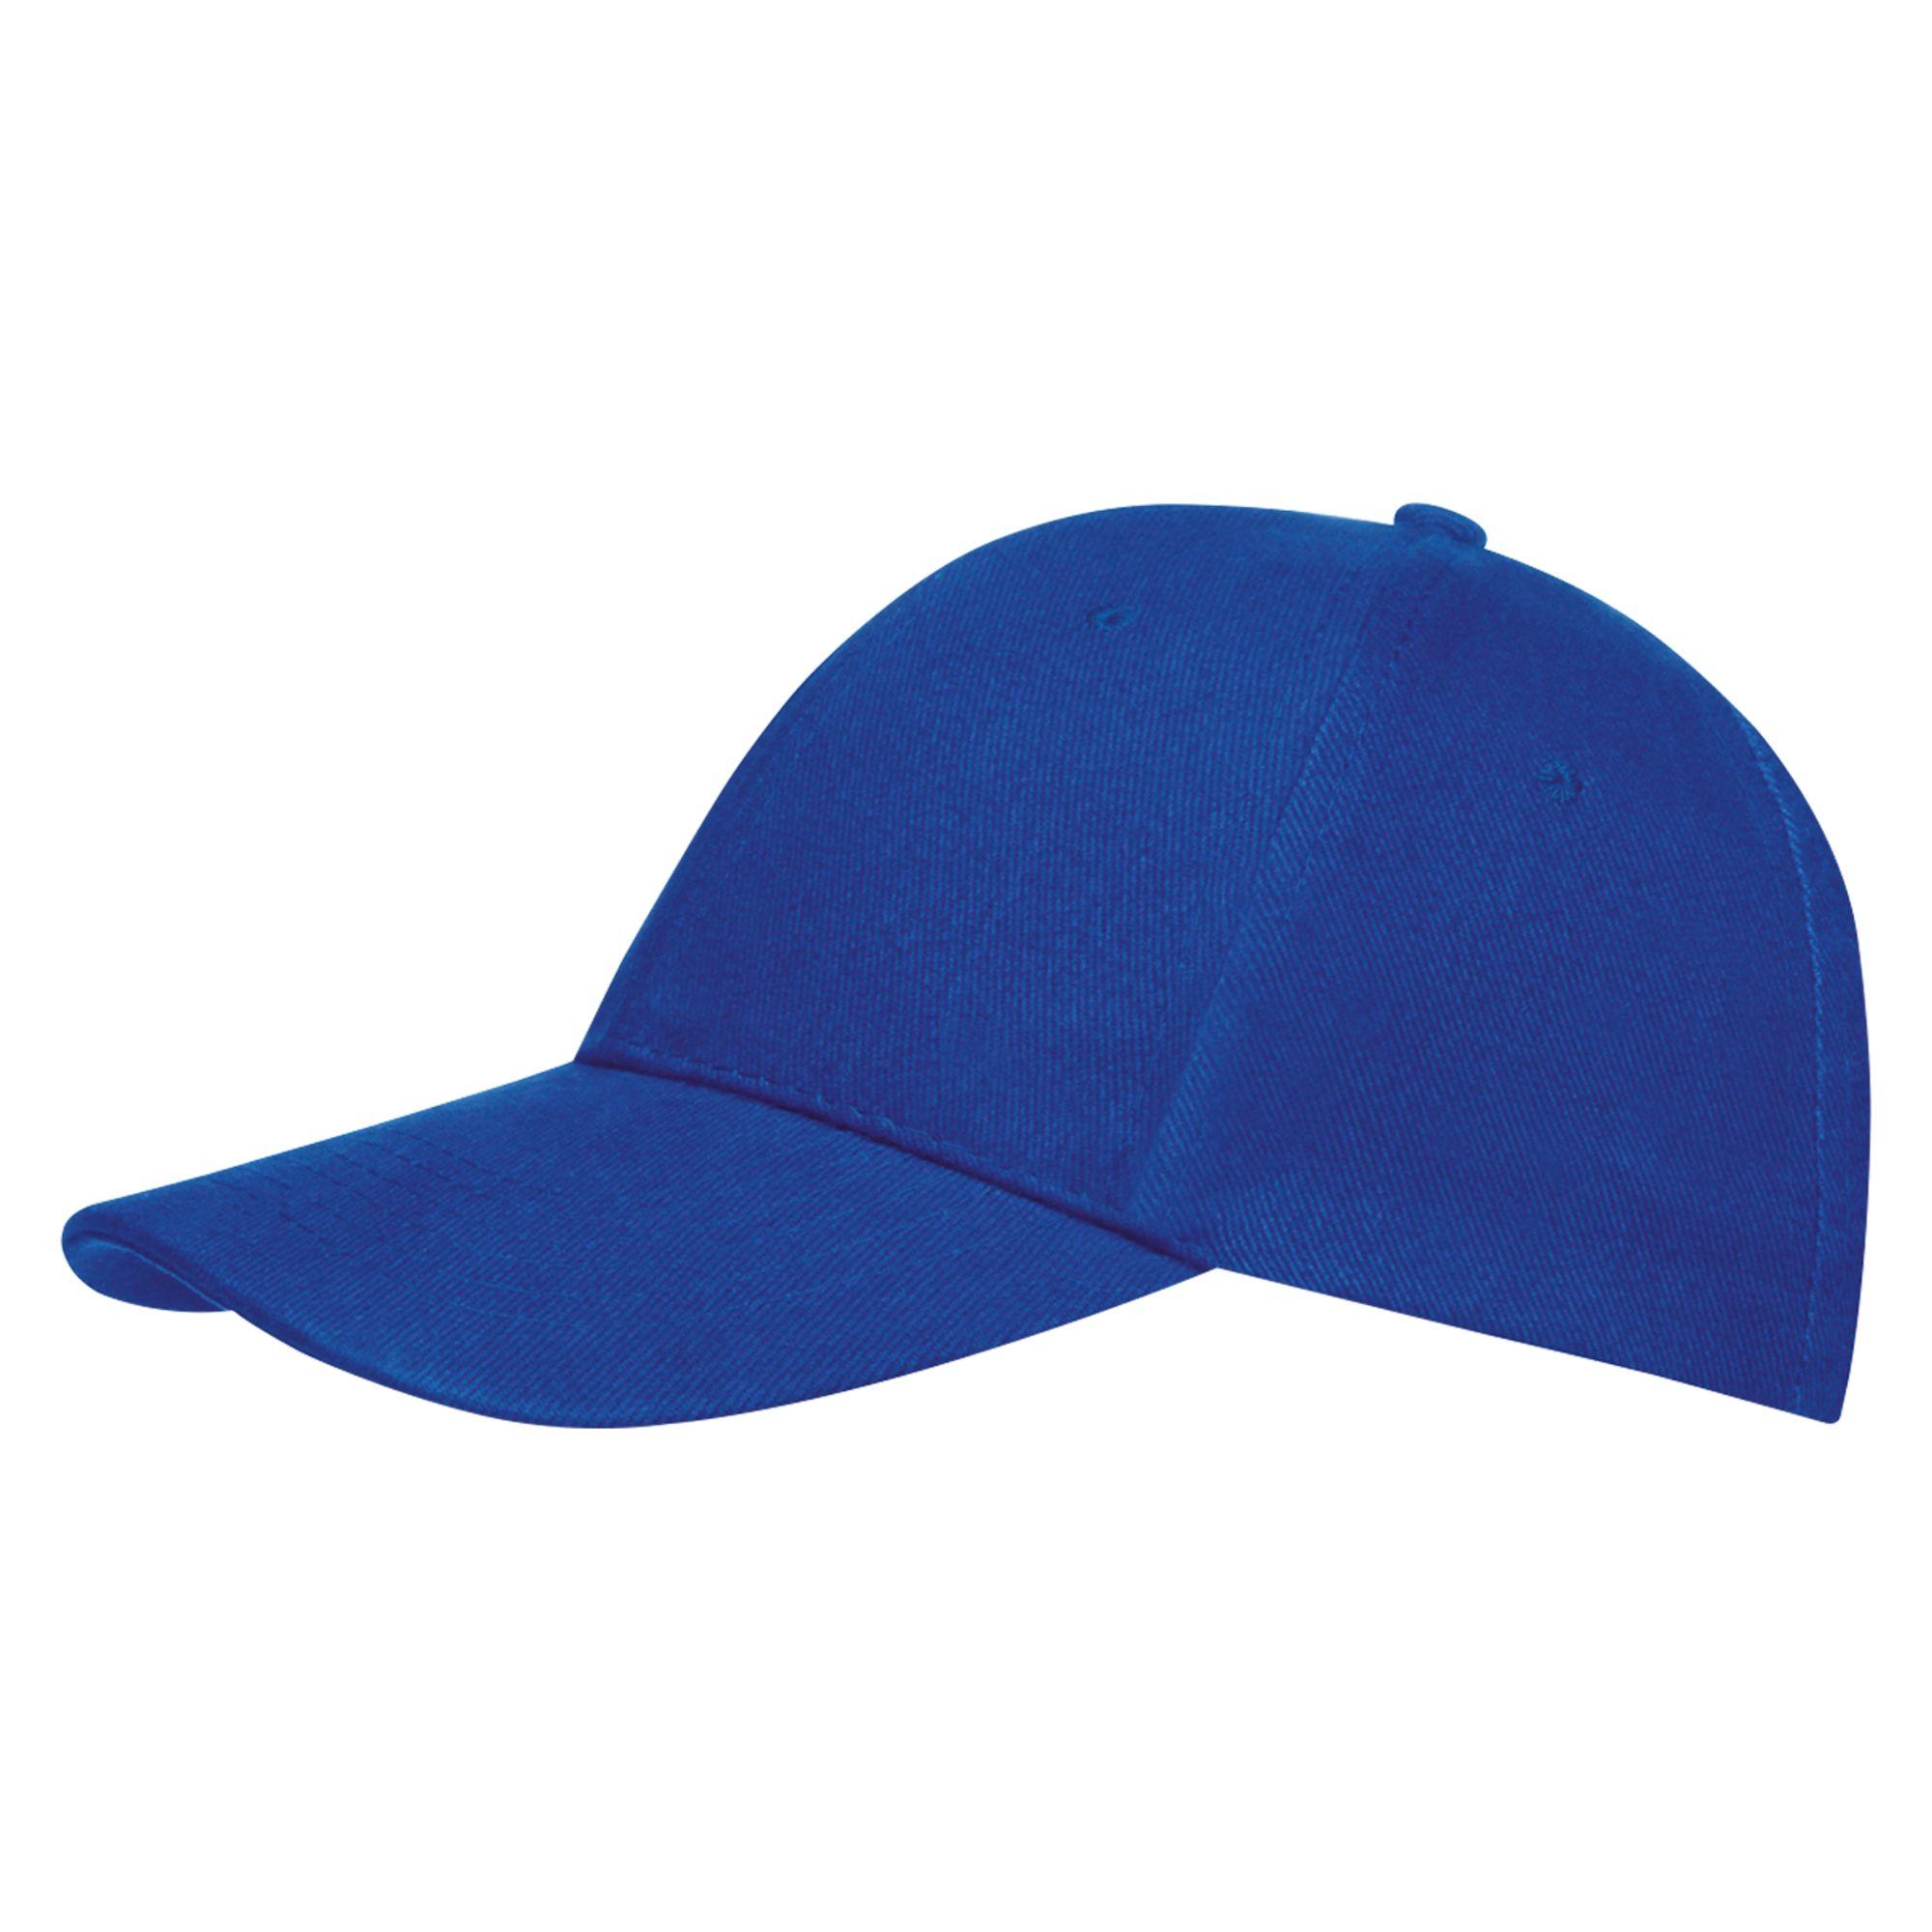 Бейсболка BUFFALO, ярко-синяя